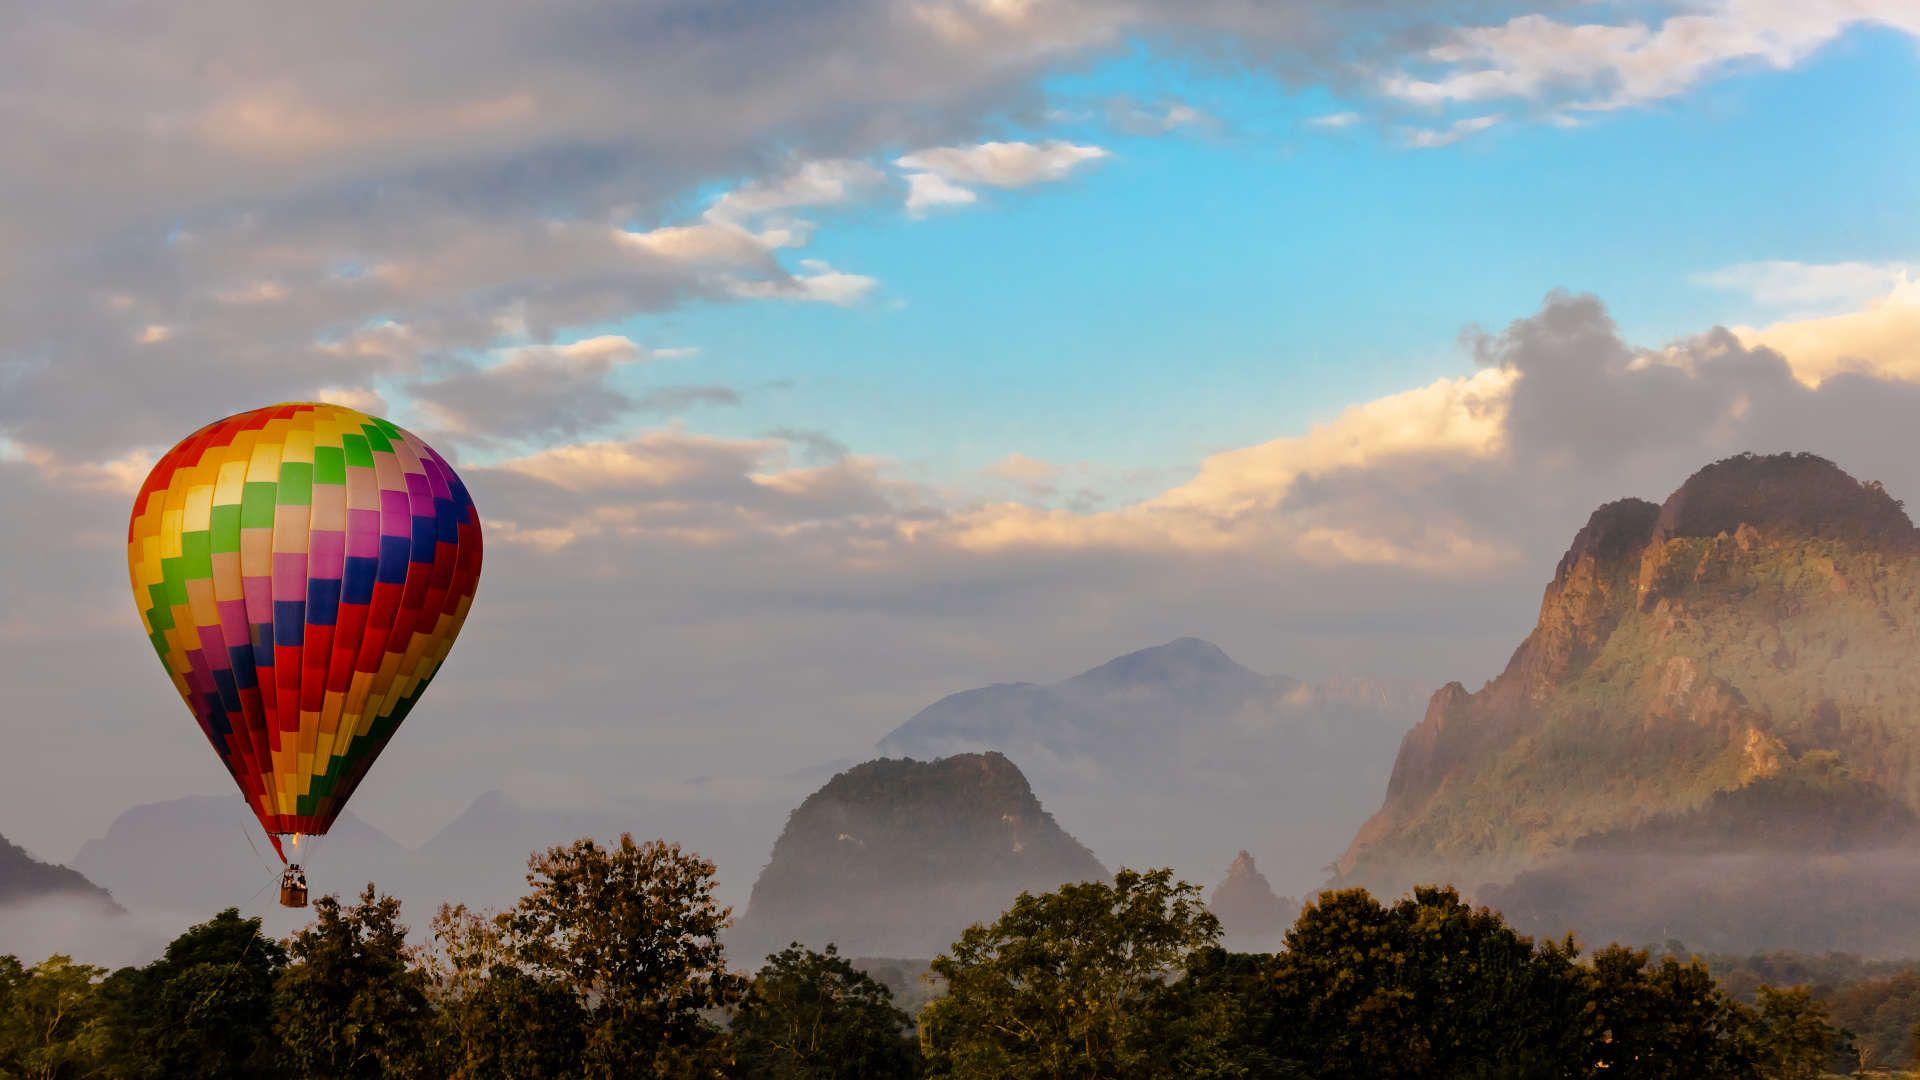 Egypt-hot-air-balloon-IML-Travel-800x600 - IML Travel Services